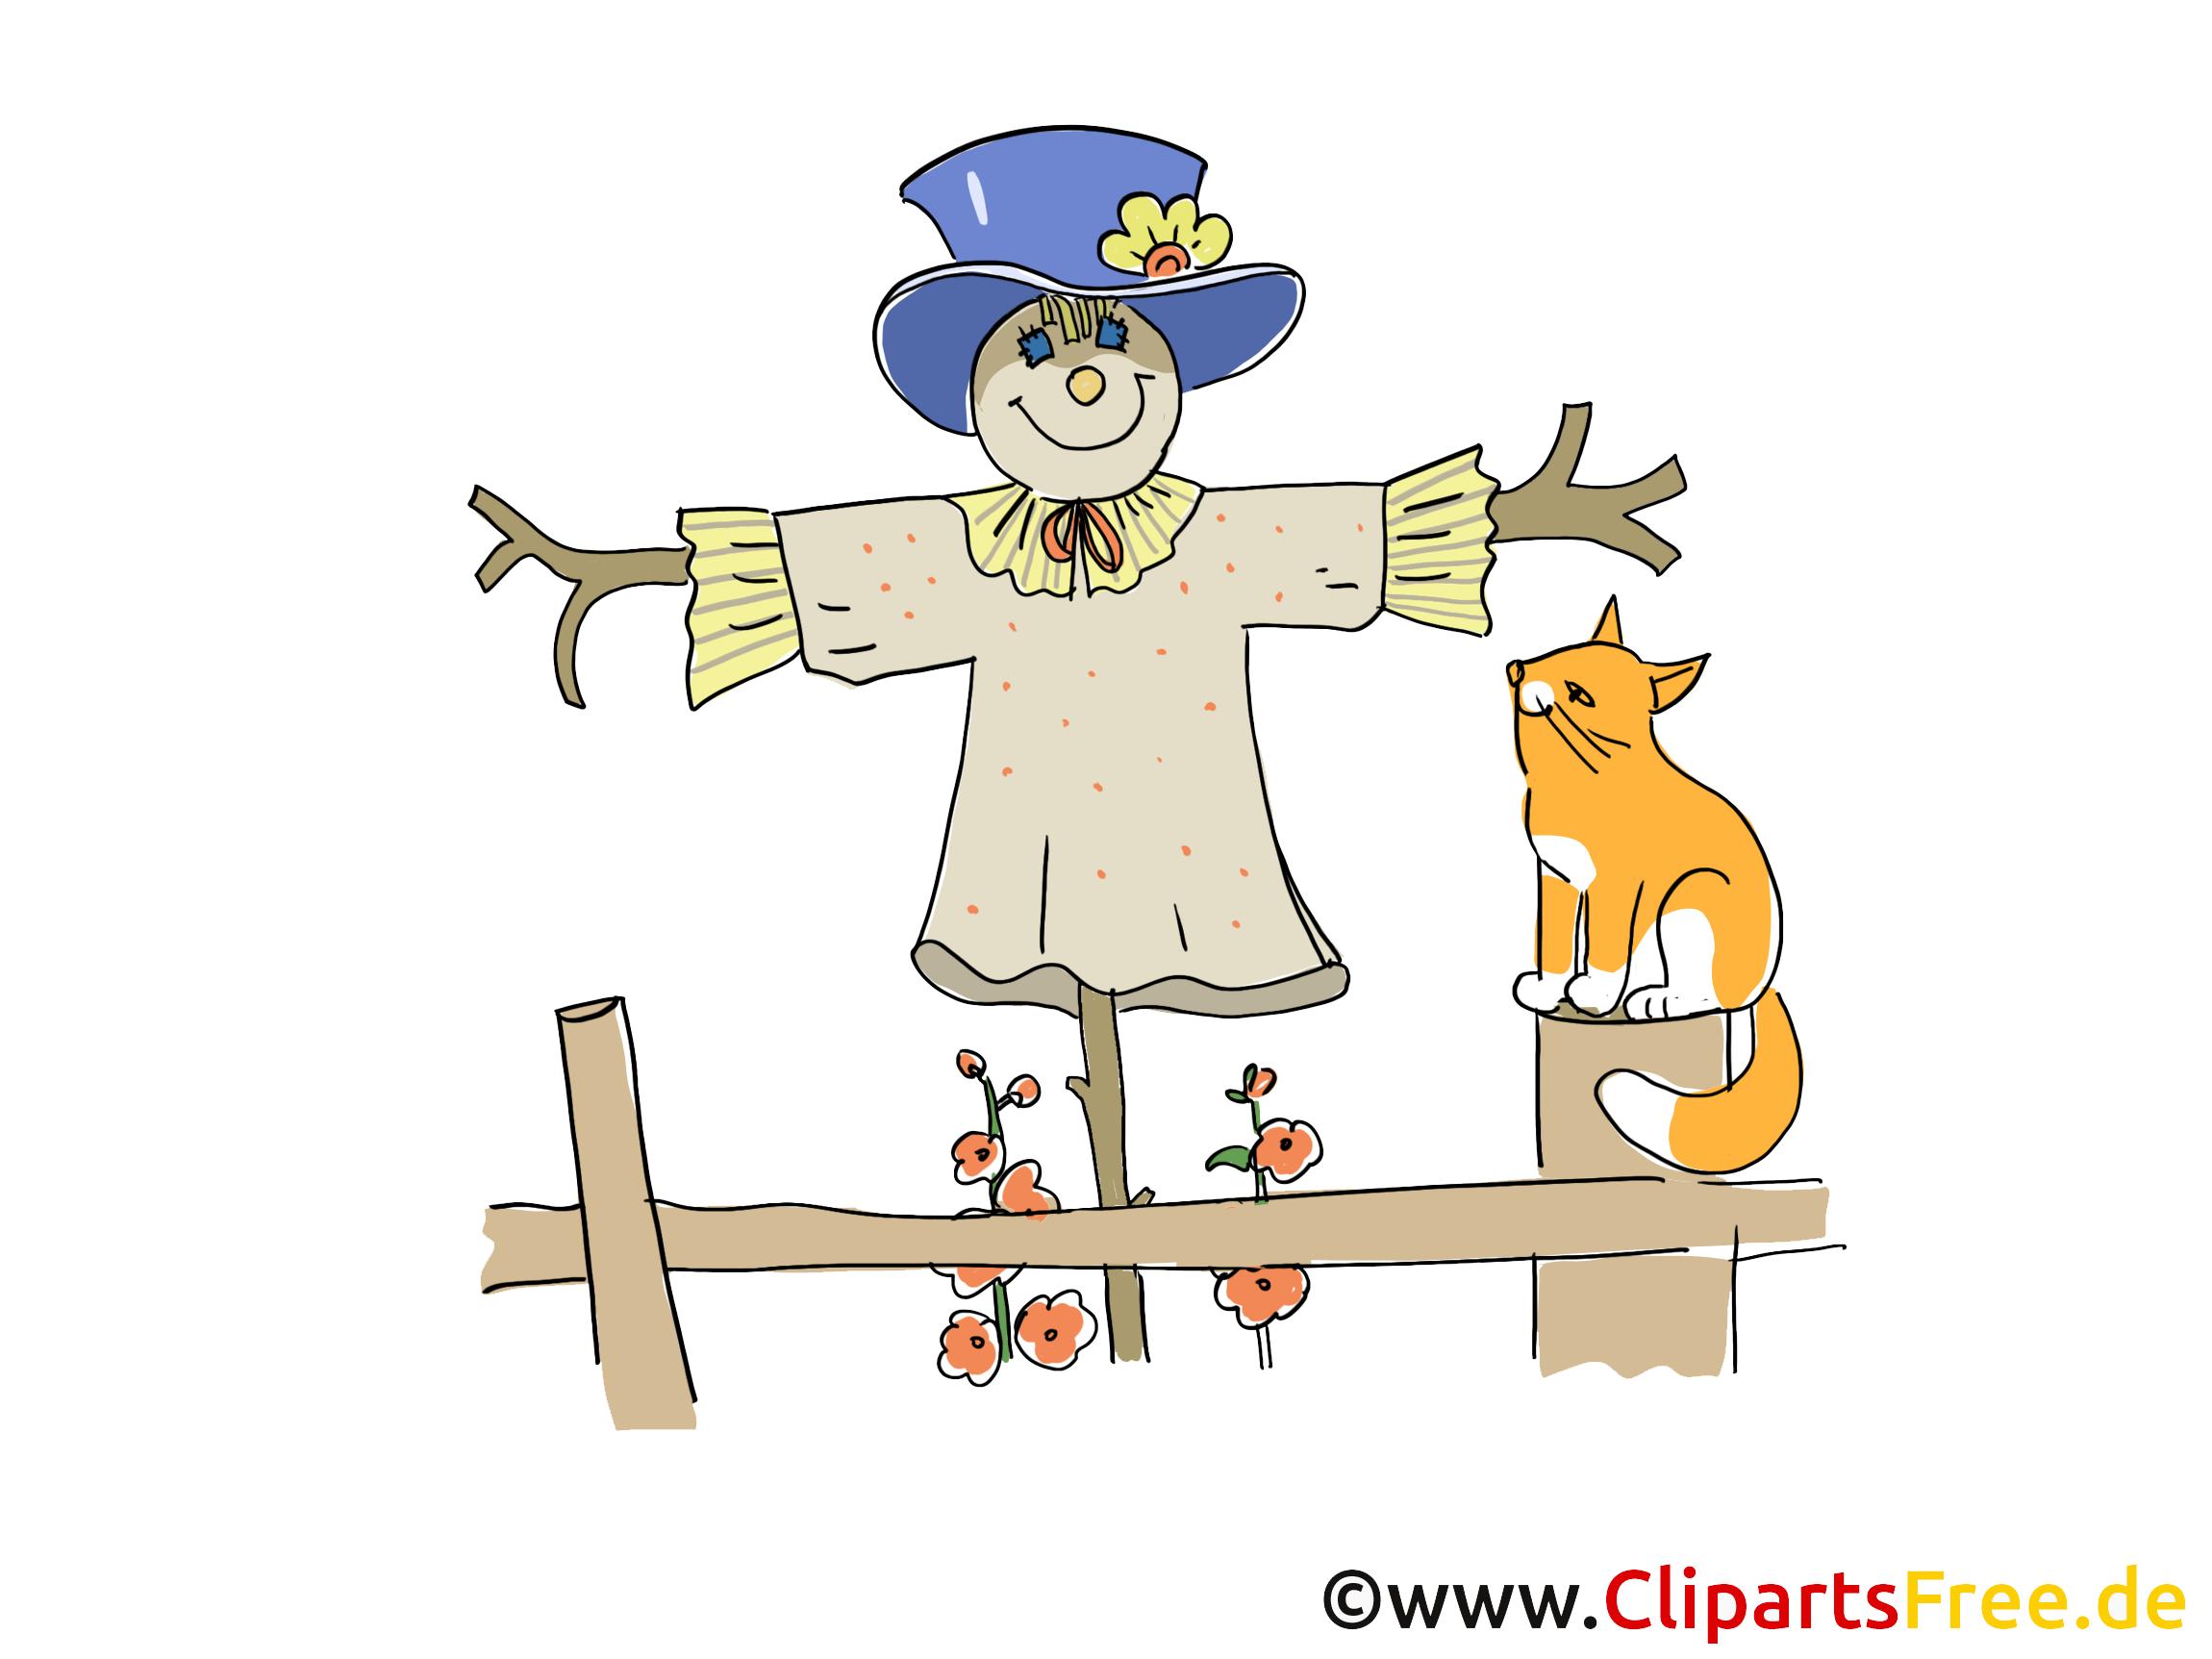 Gratis Clipart Vogelscheuhe